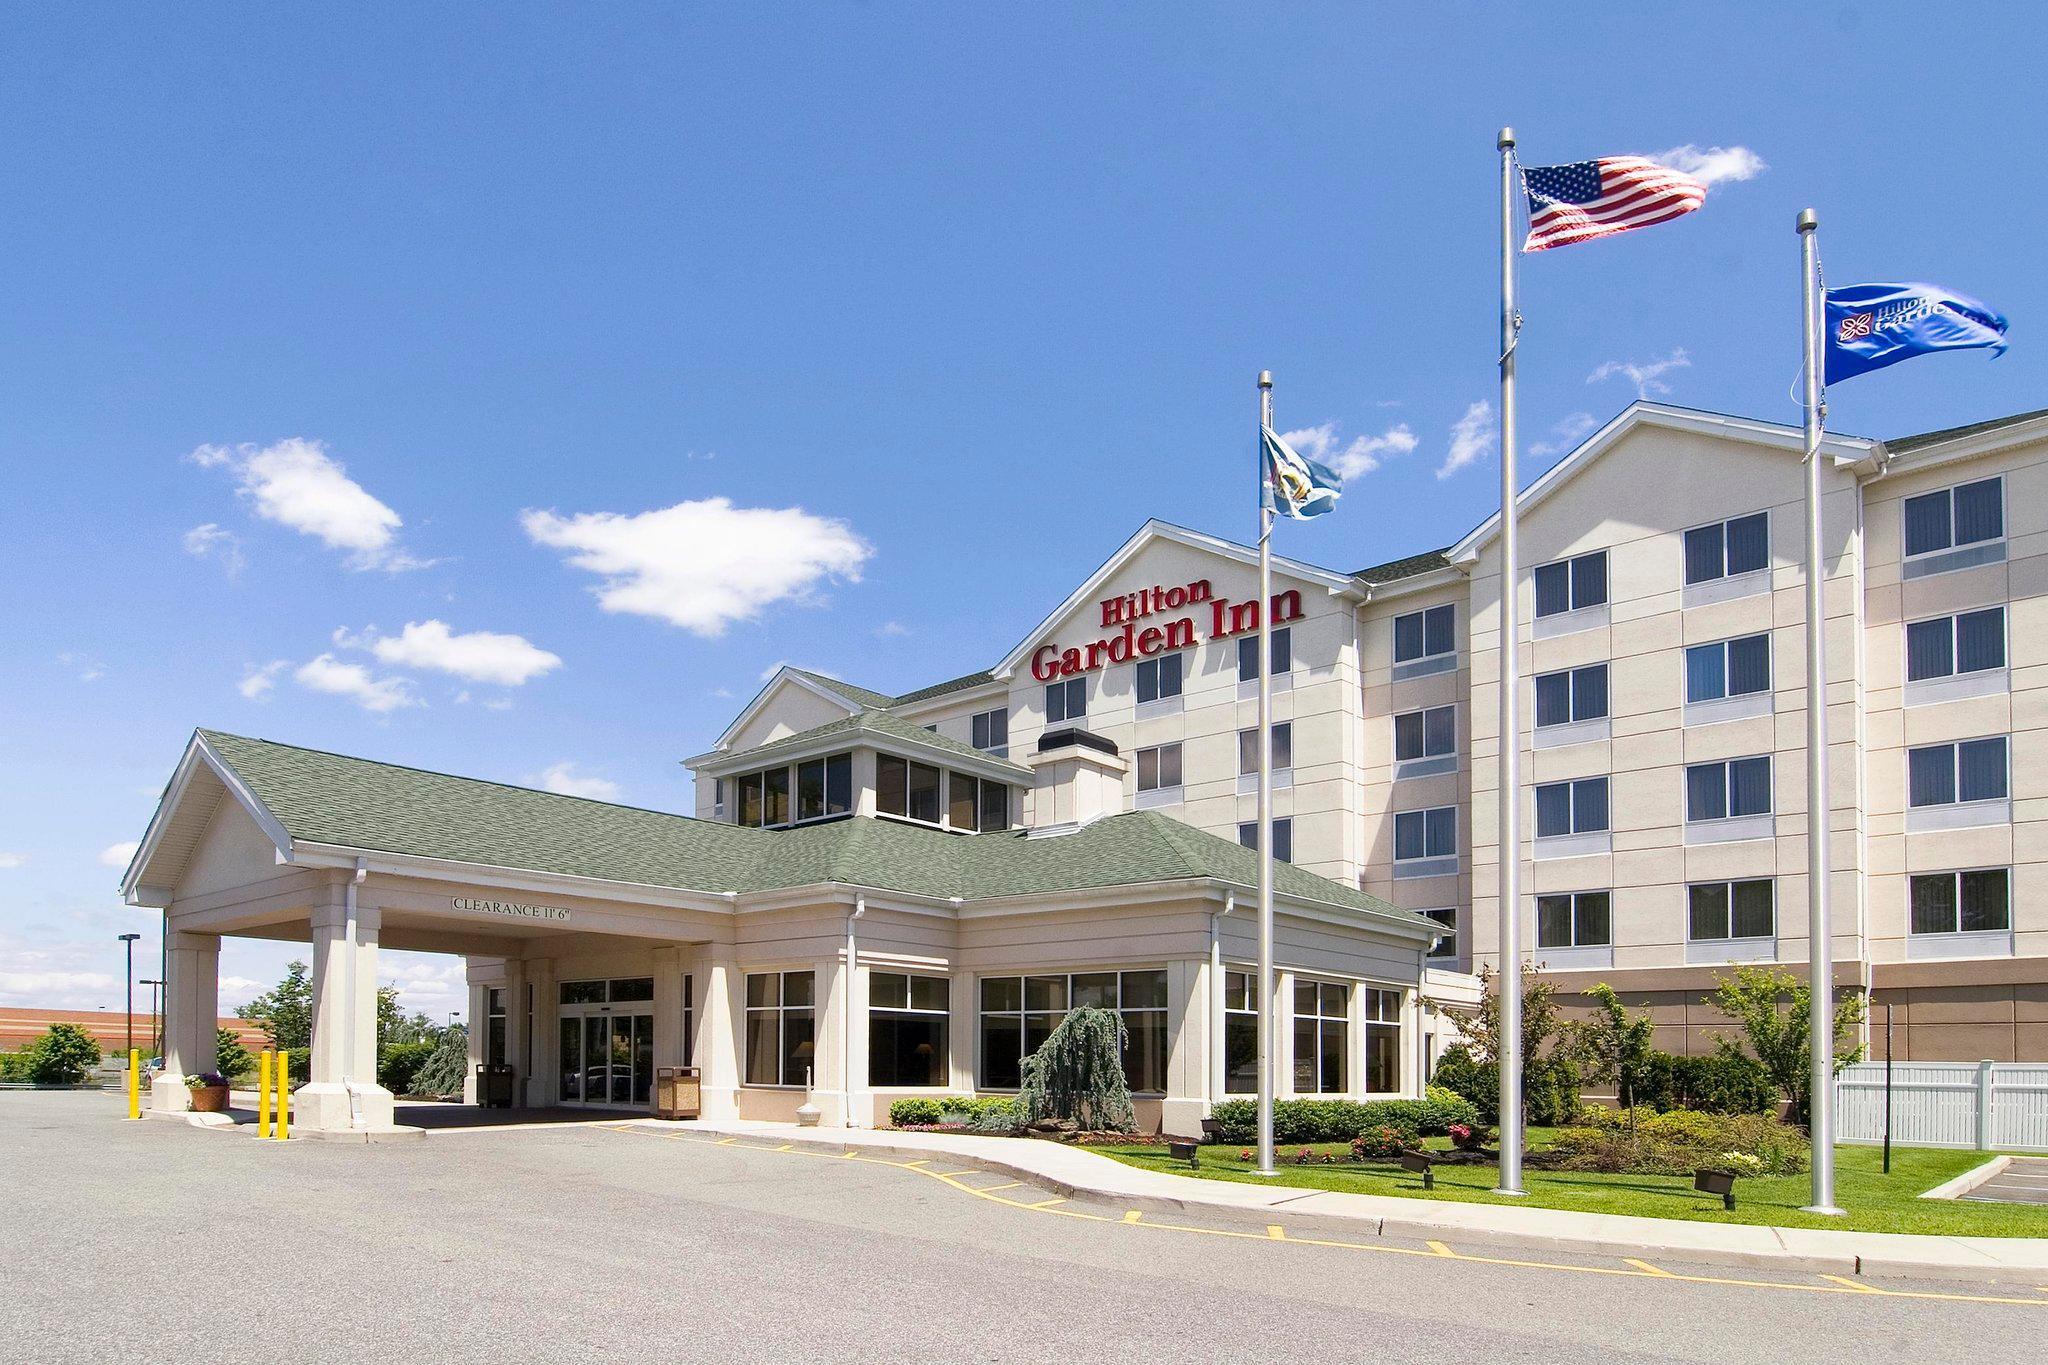 Hilton Garden Inn Nanuet Hotel